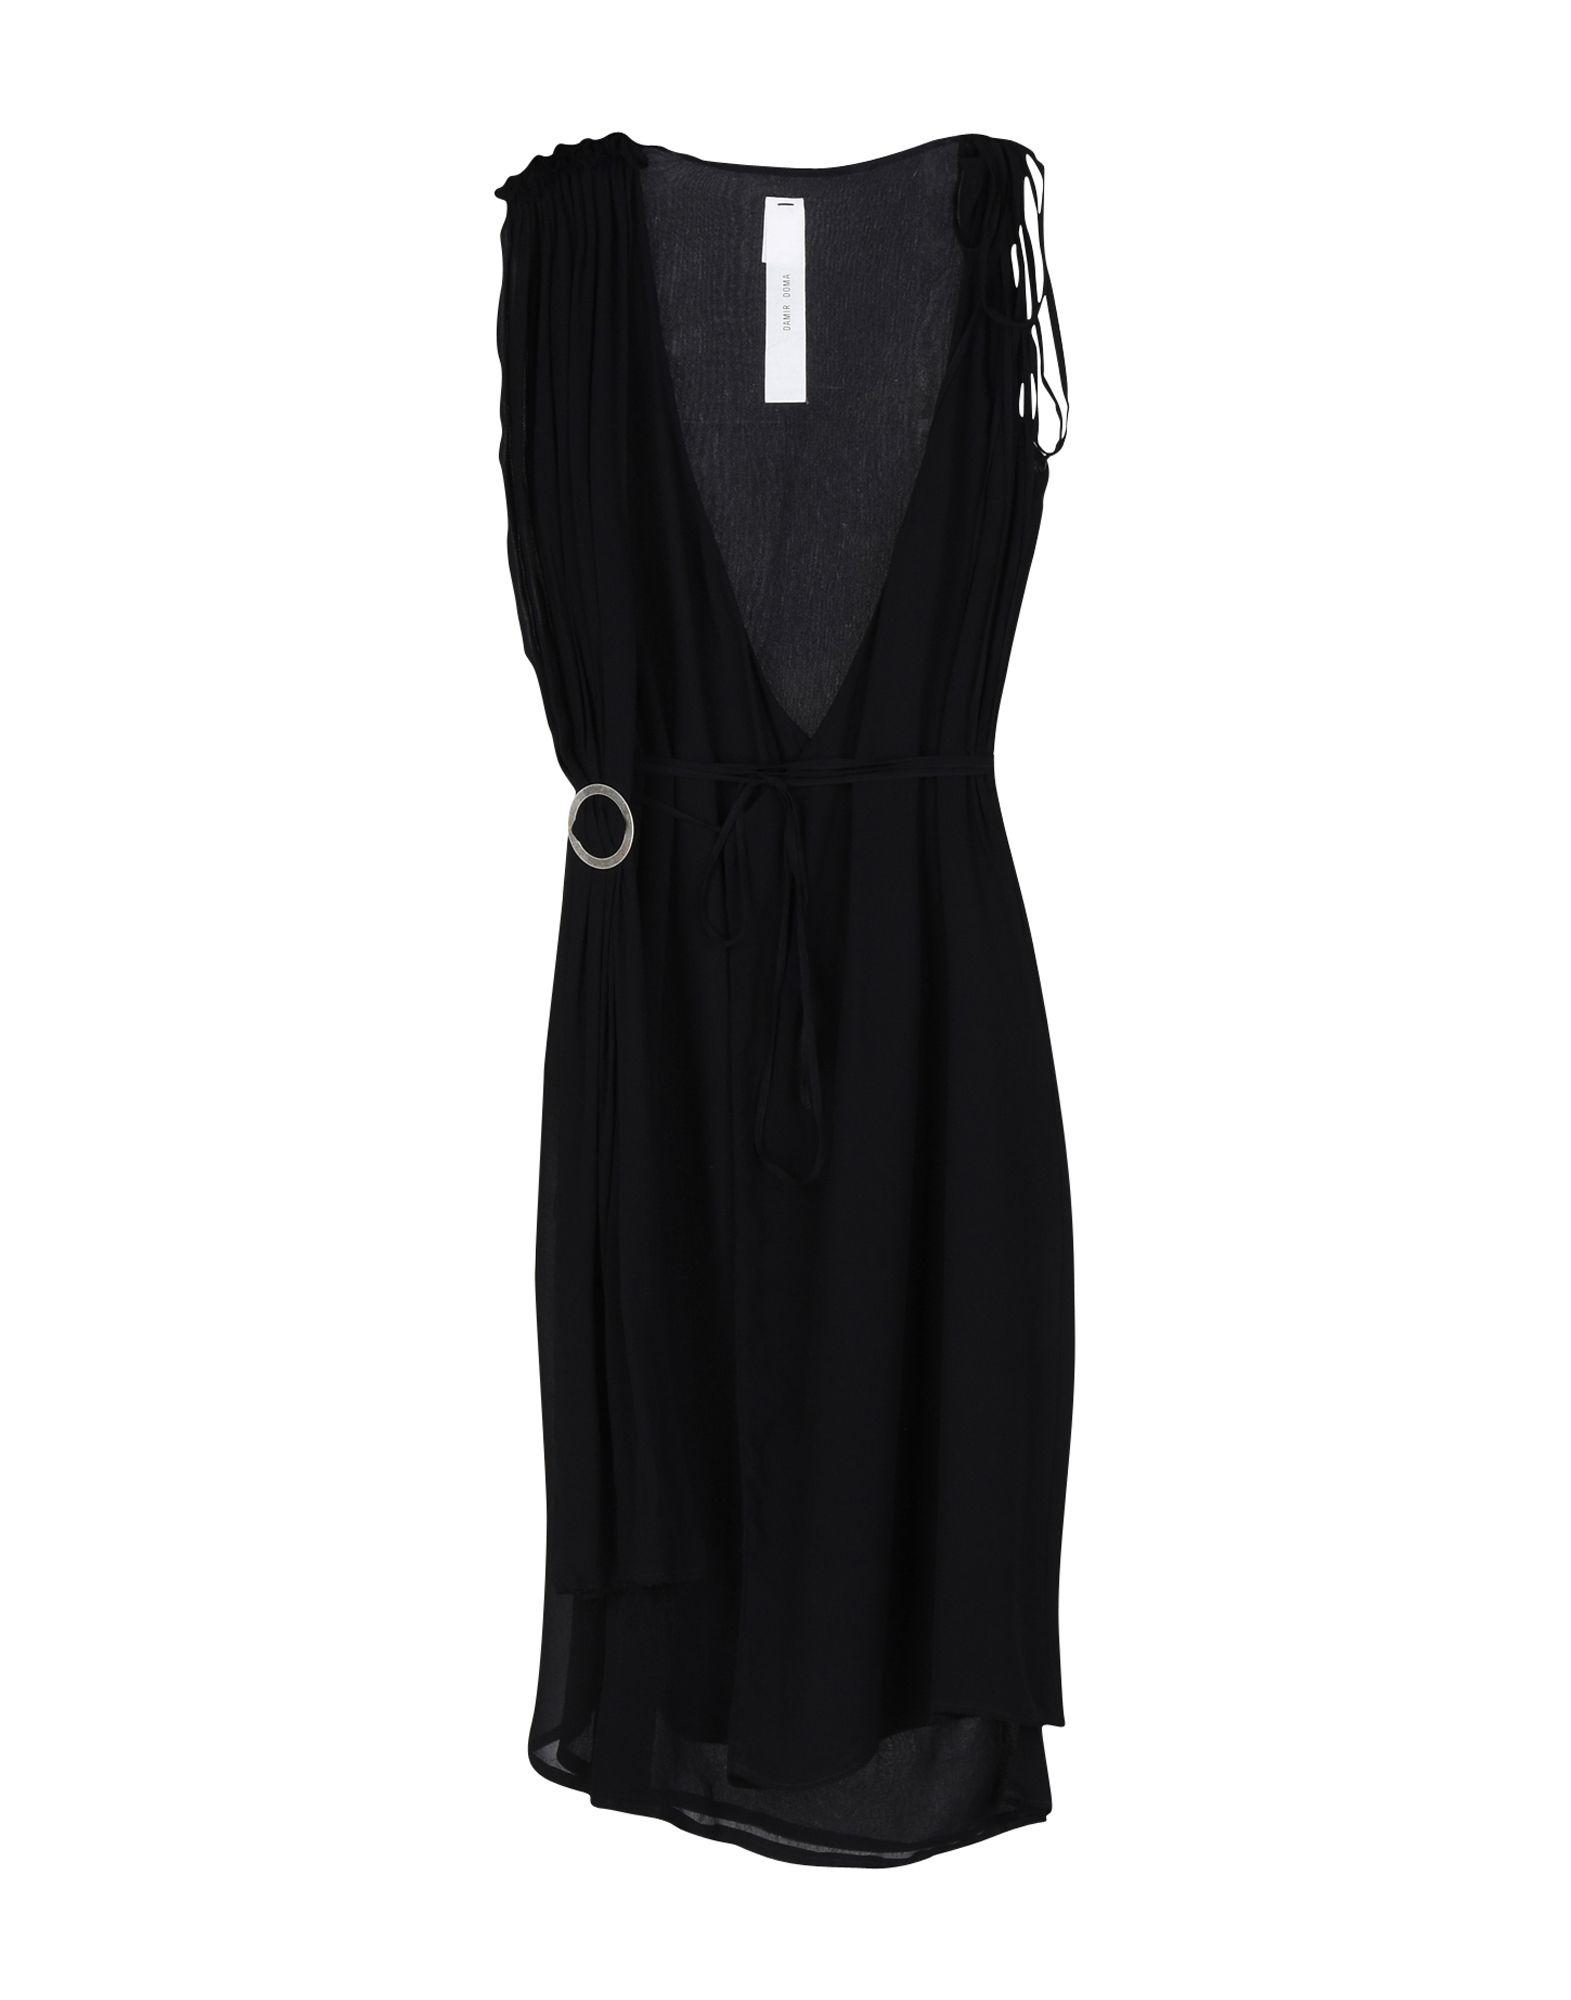 DRESSES - Knee-length dresses Damir Doma QvlMN